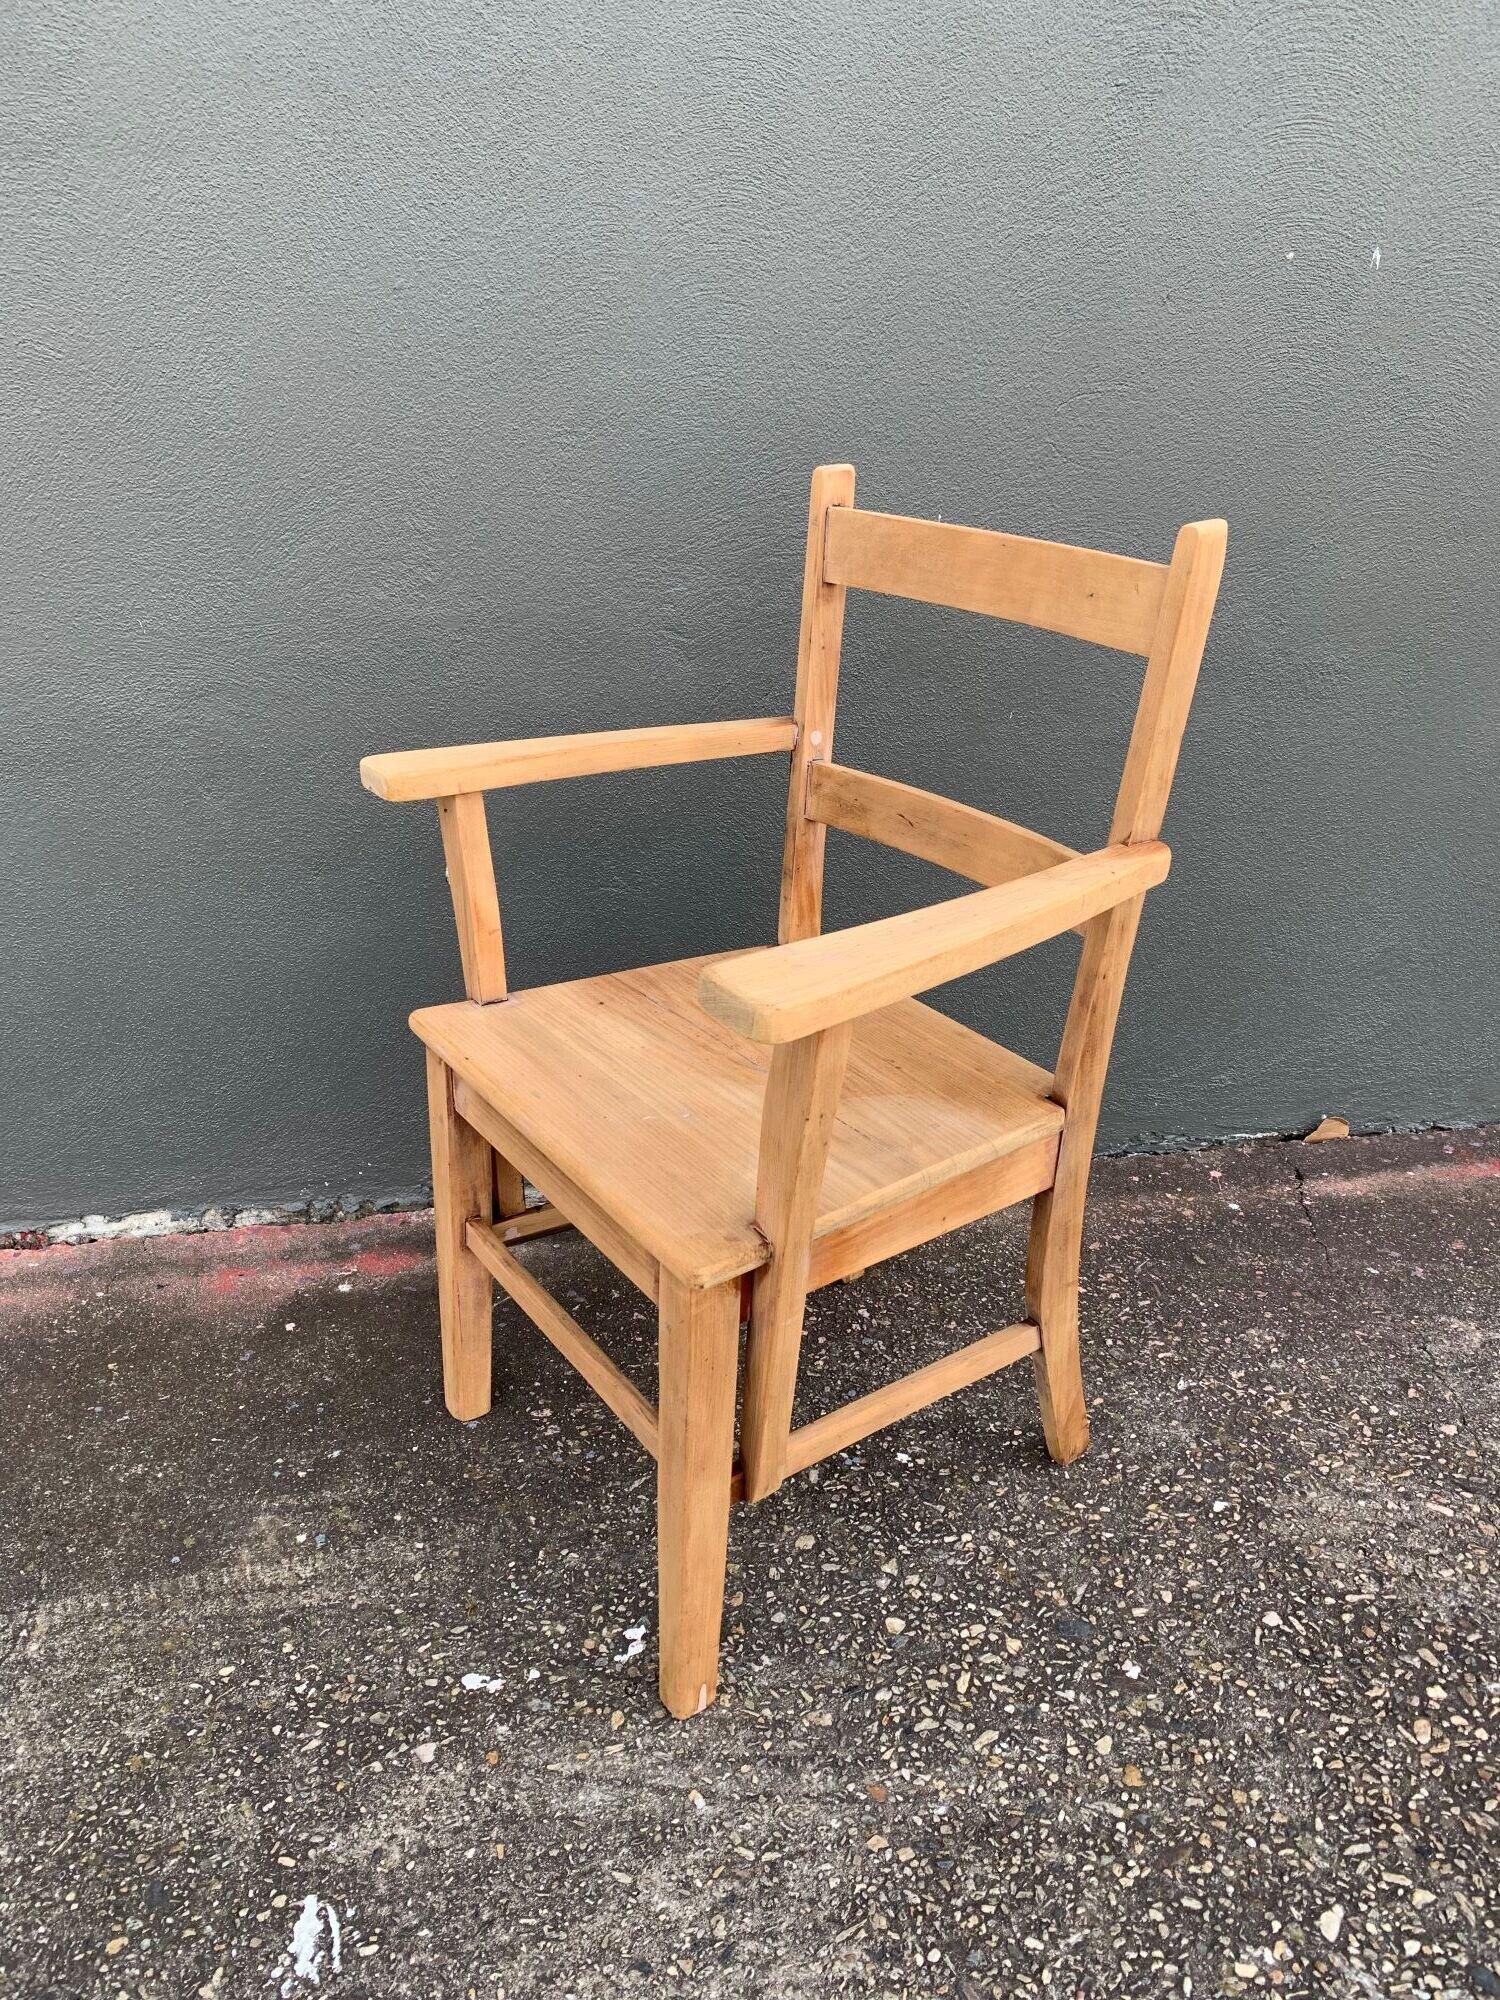 chair before restoration bywater design.jpg